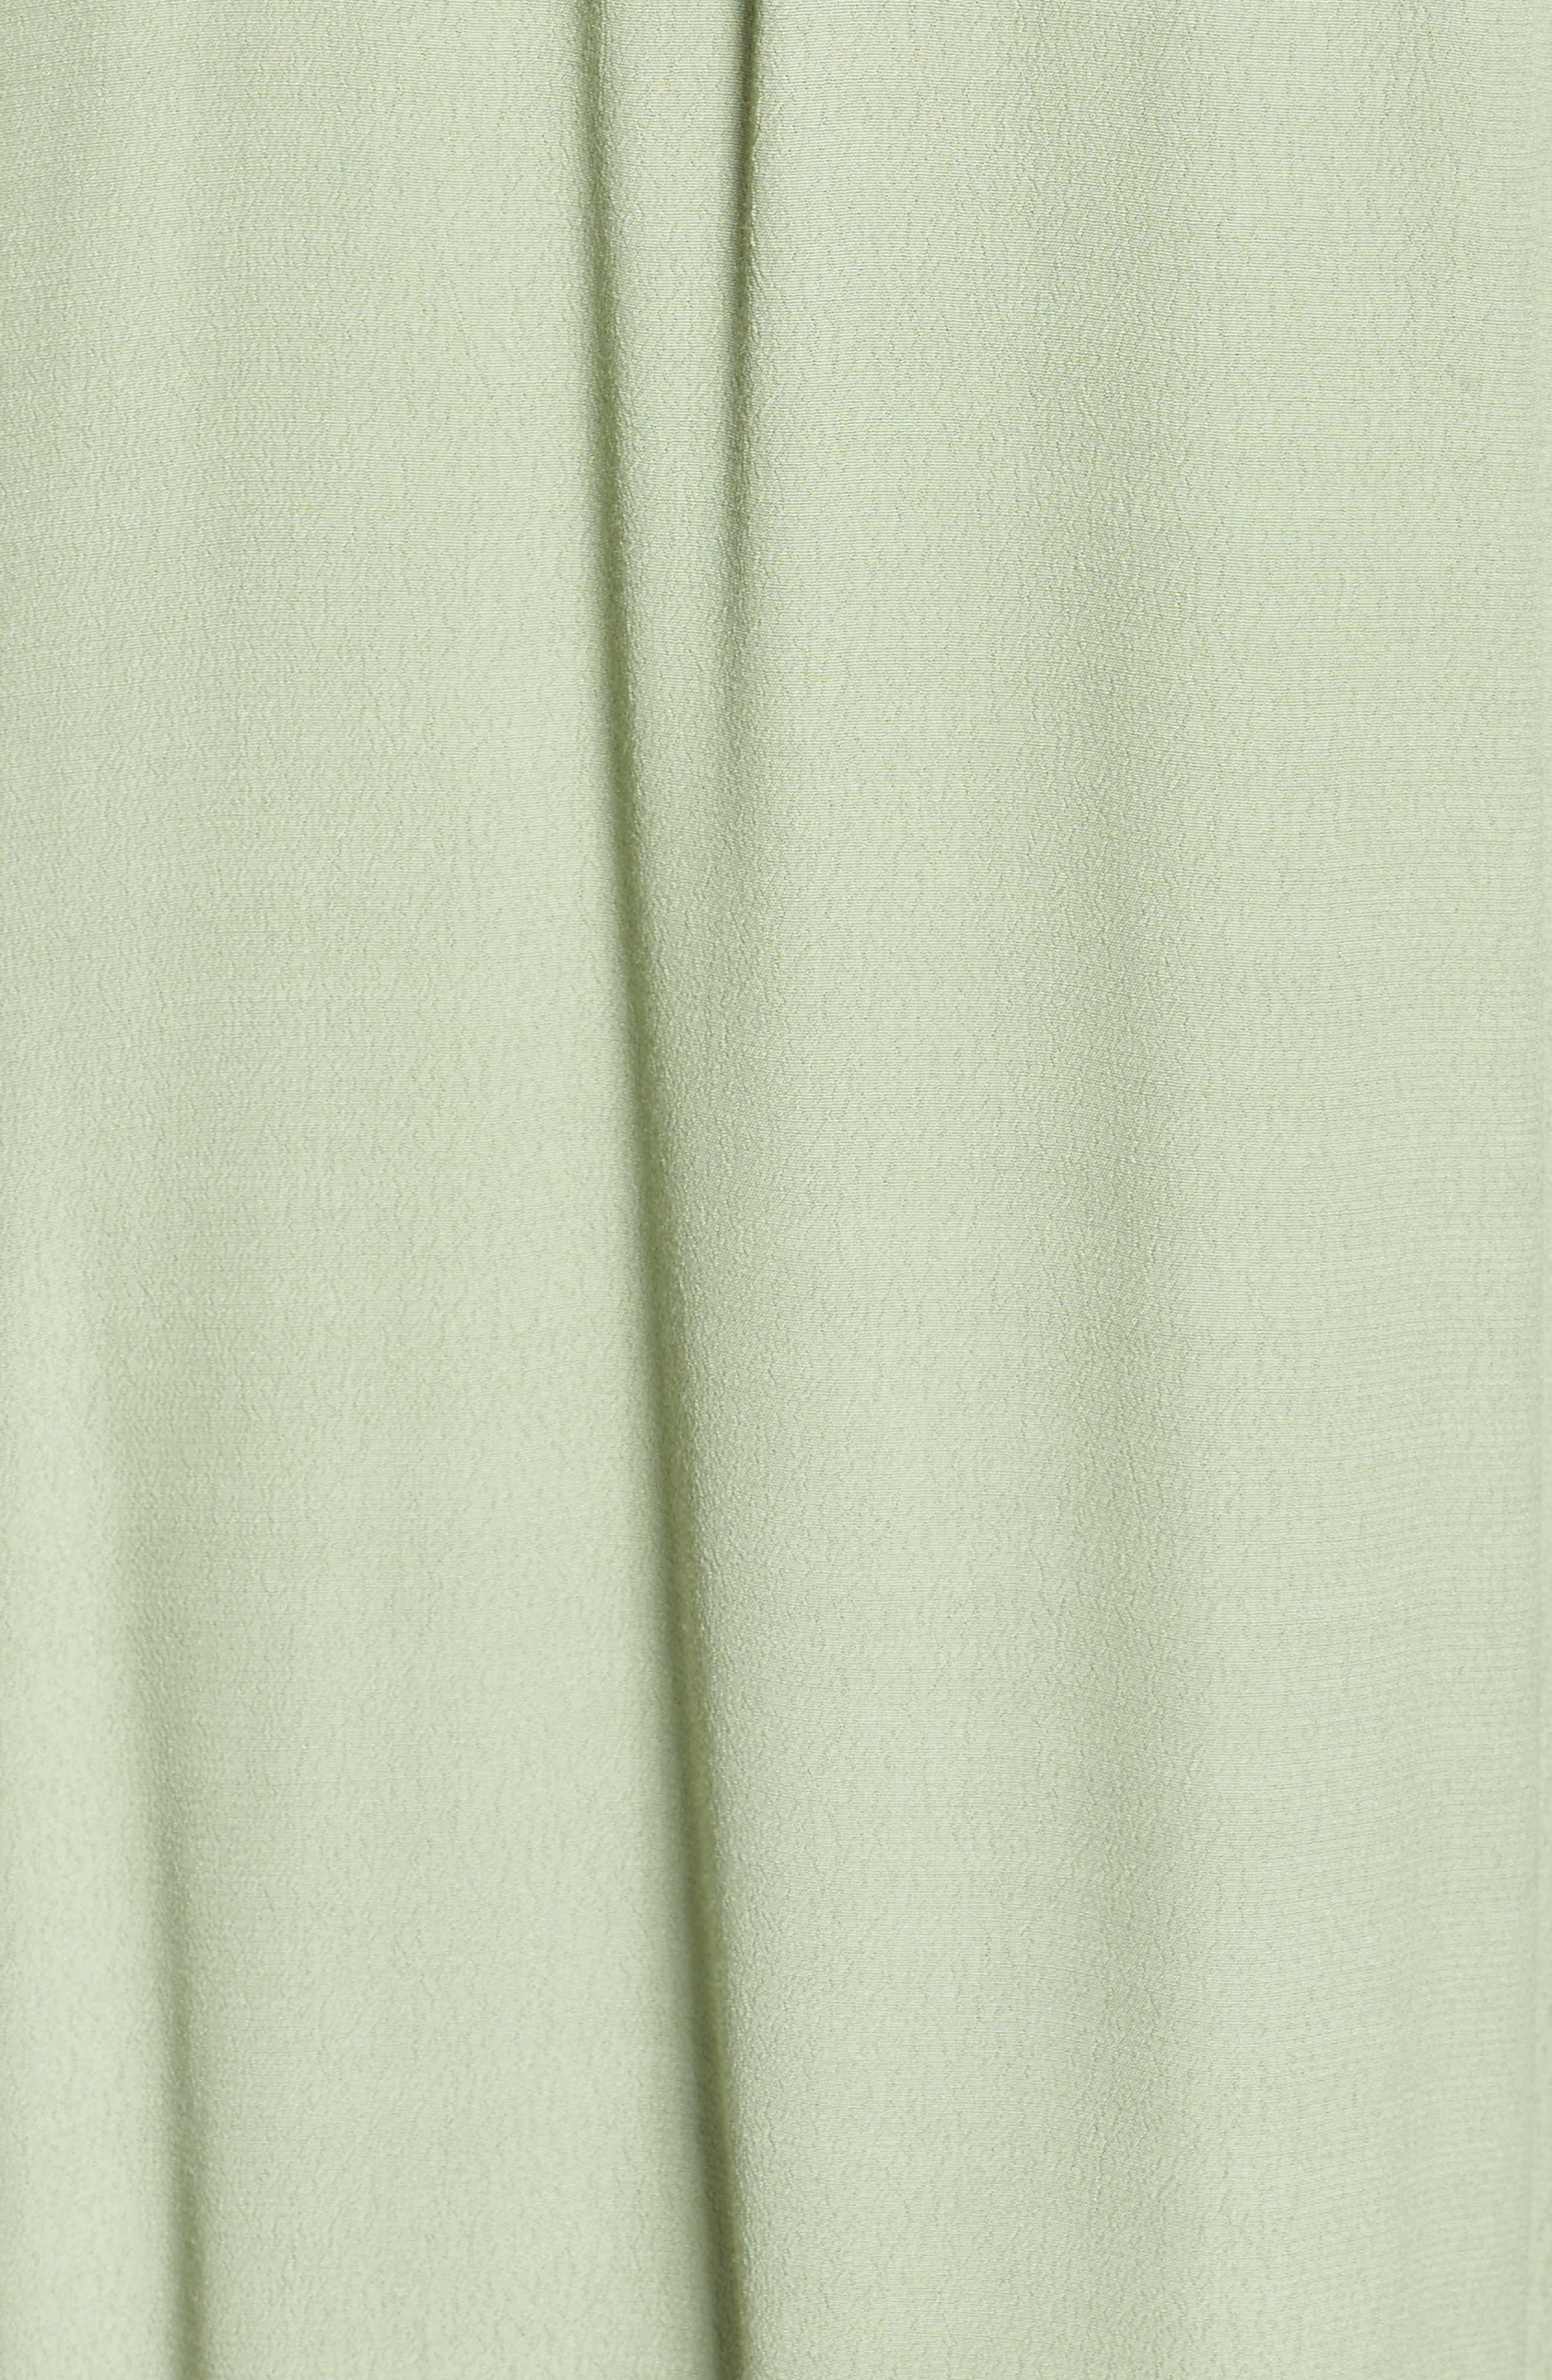 Roe + May Jolie Crepe Peplum Dress,                             Alternate thumbnail 5, color,                             310